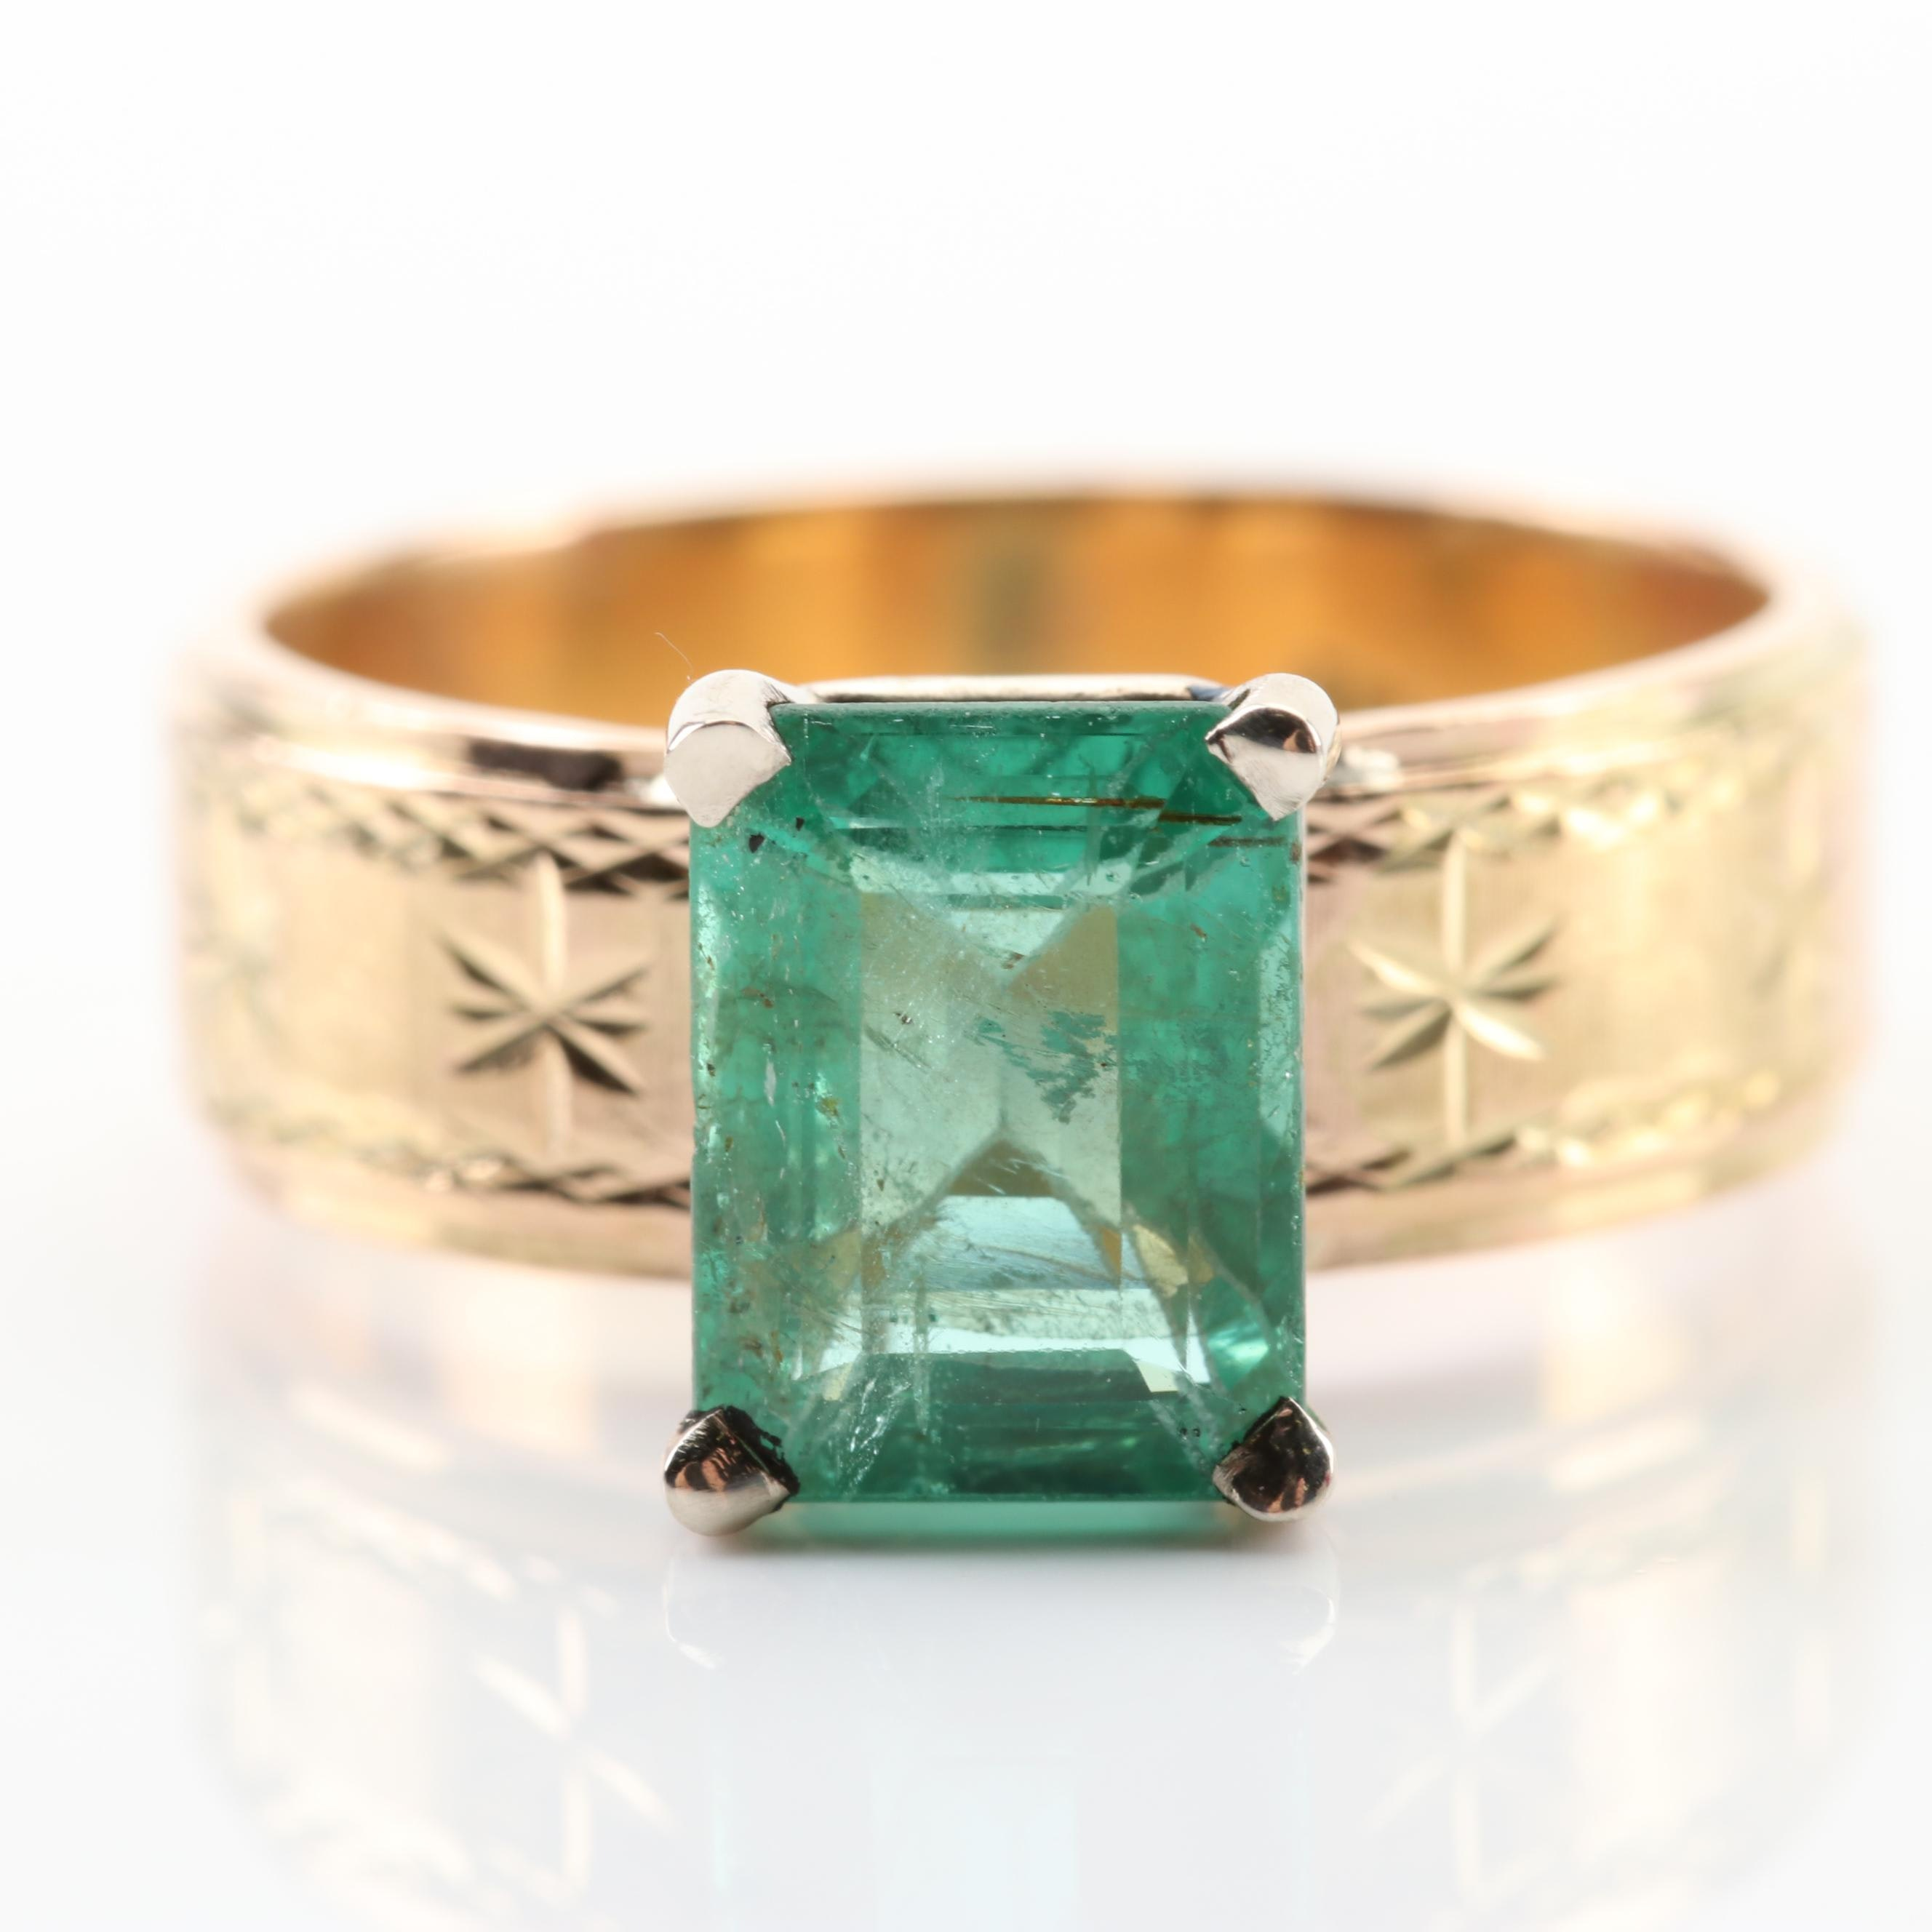 18K Yellow Gold 1.61 CT Emerald Ring